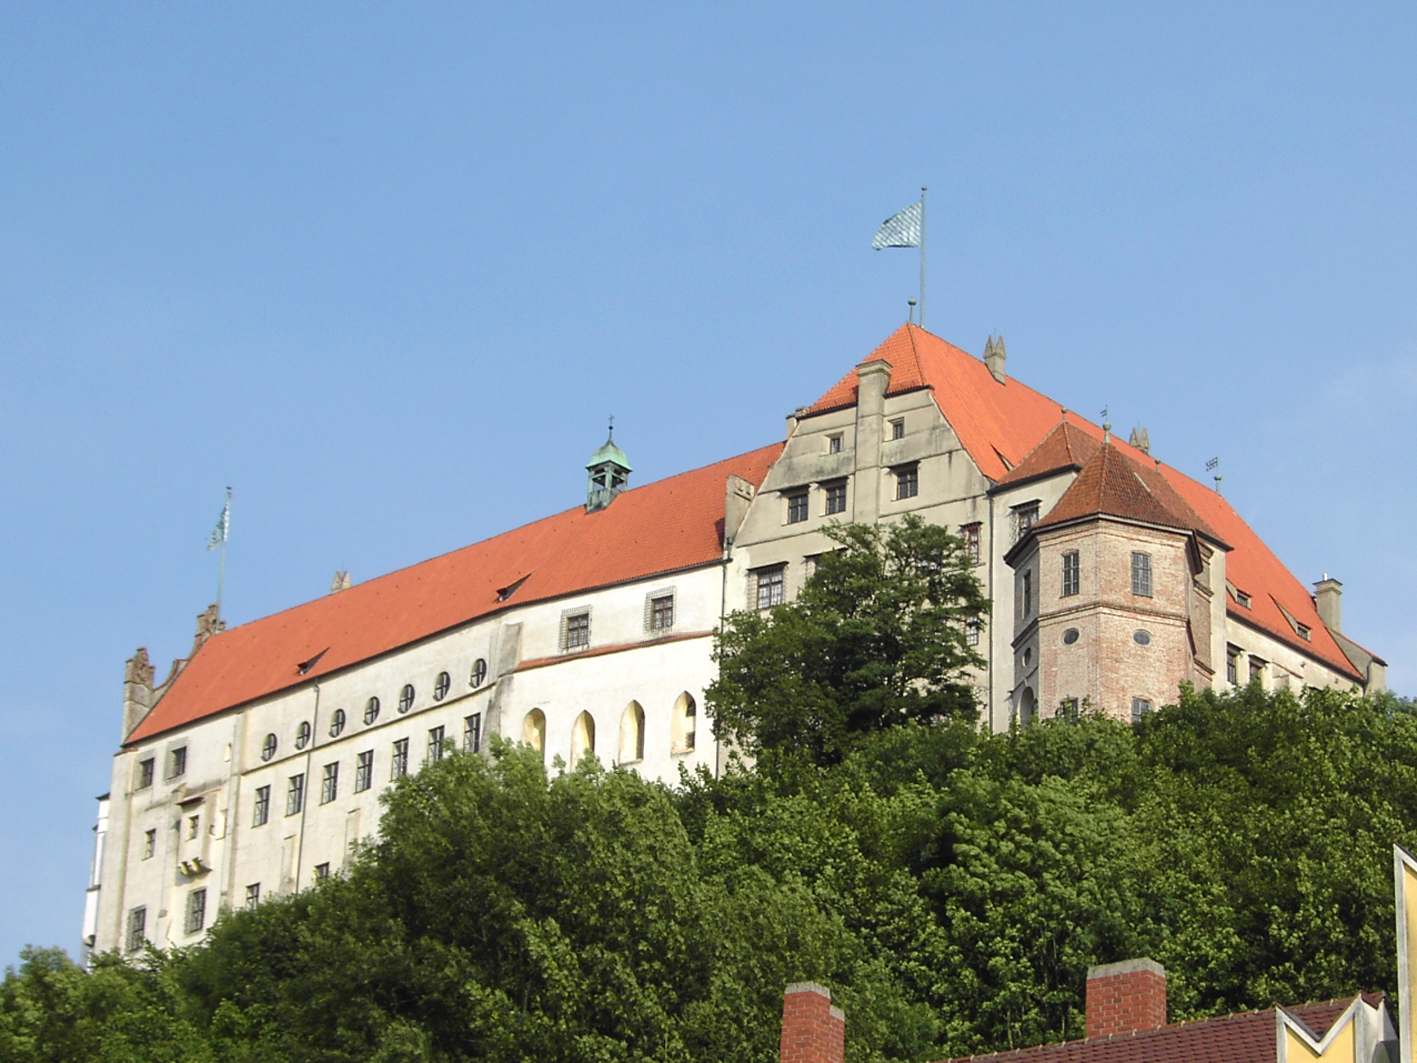 Замок Траусниц - сердце старой столицы Баварии